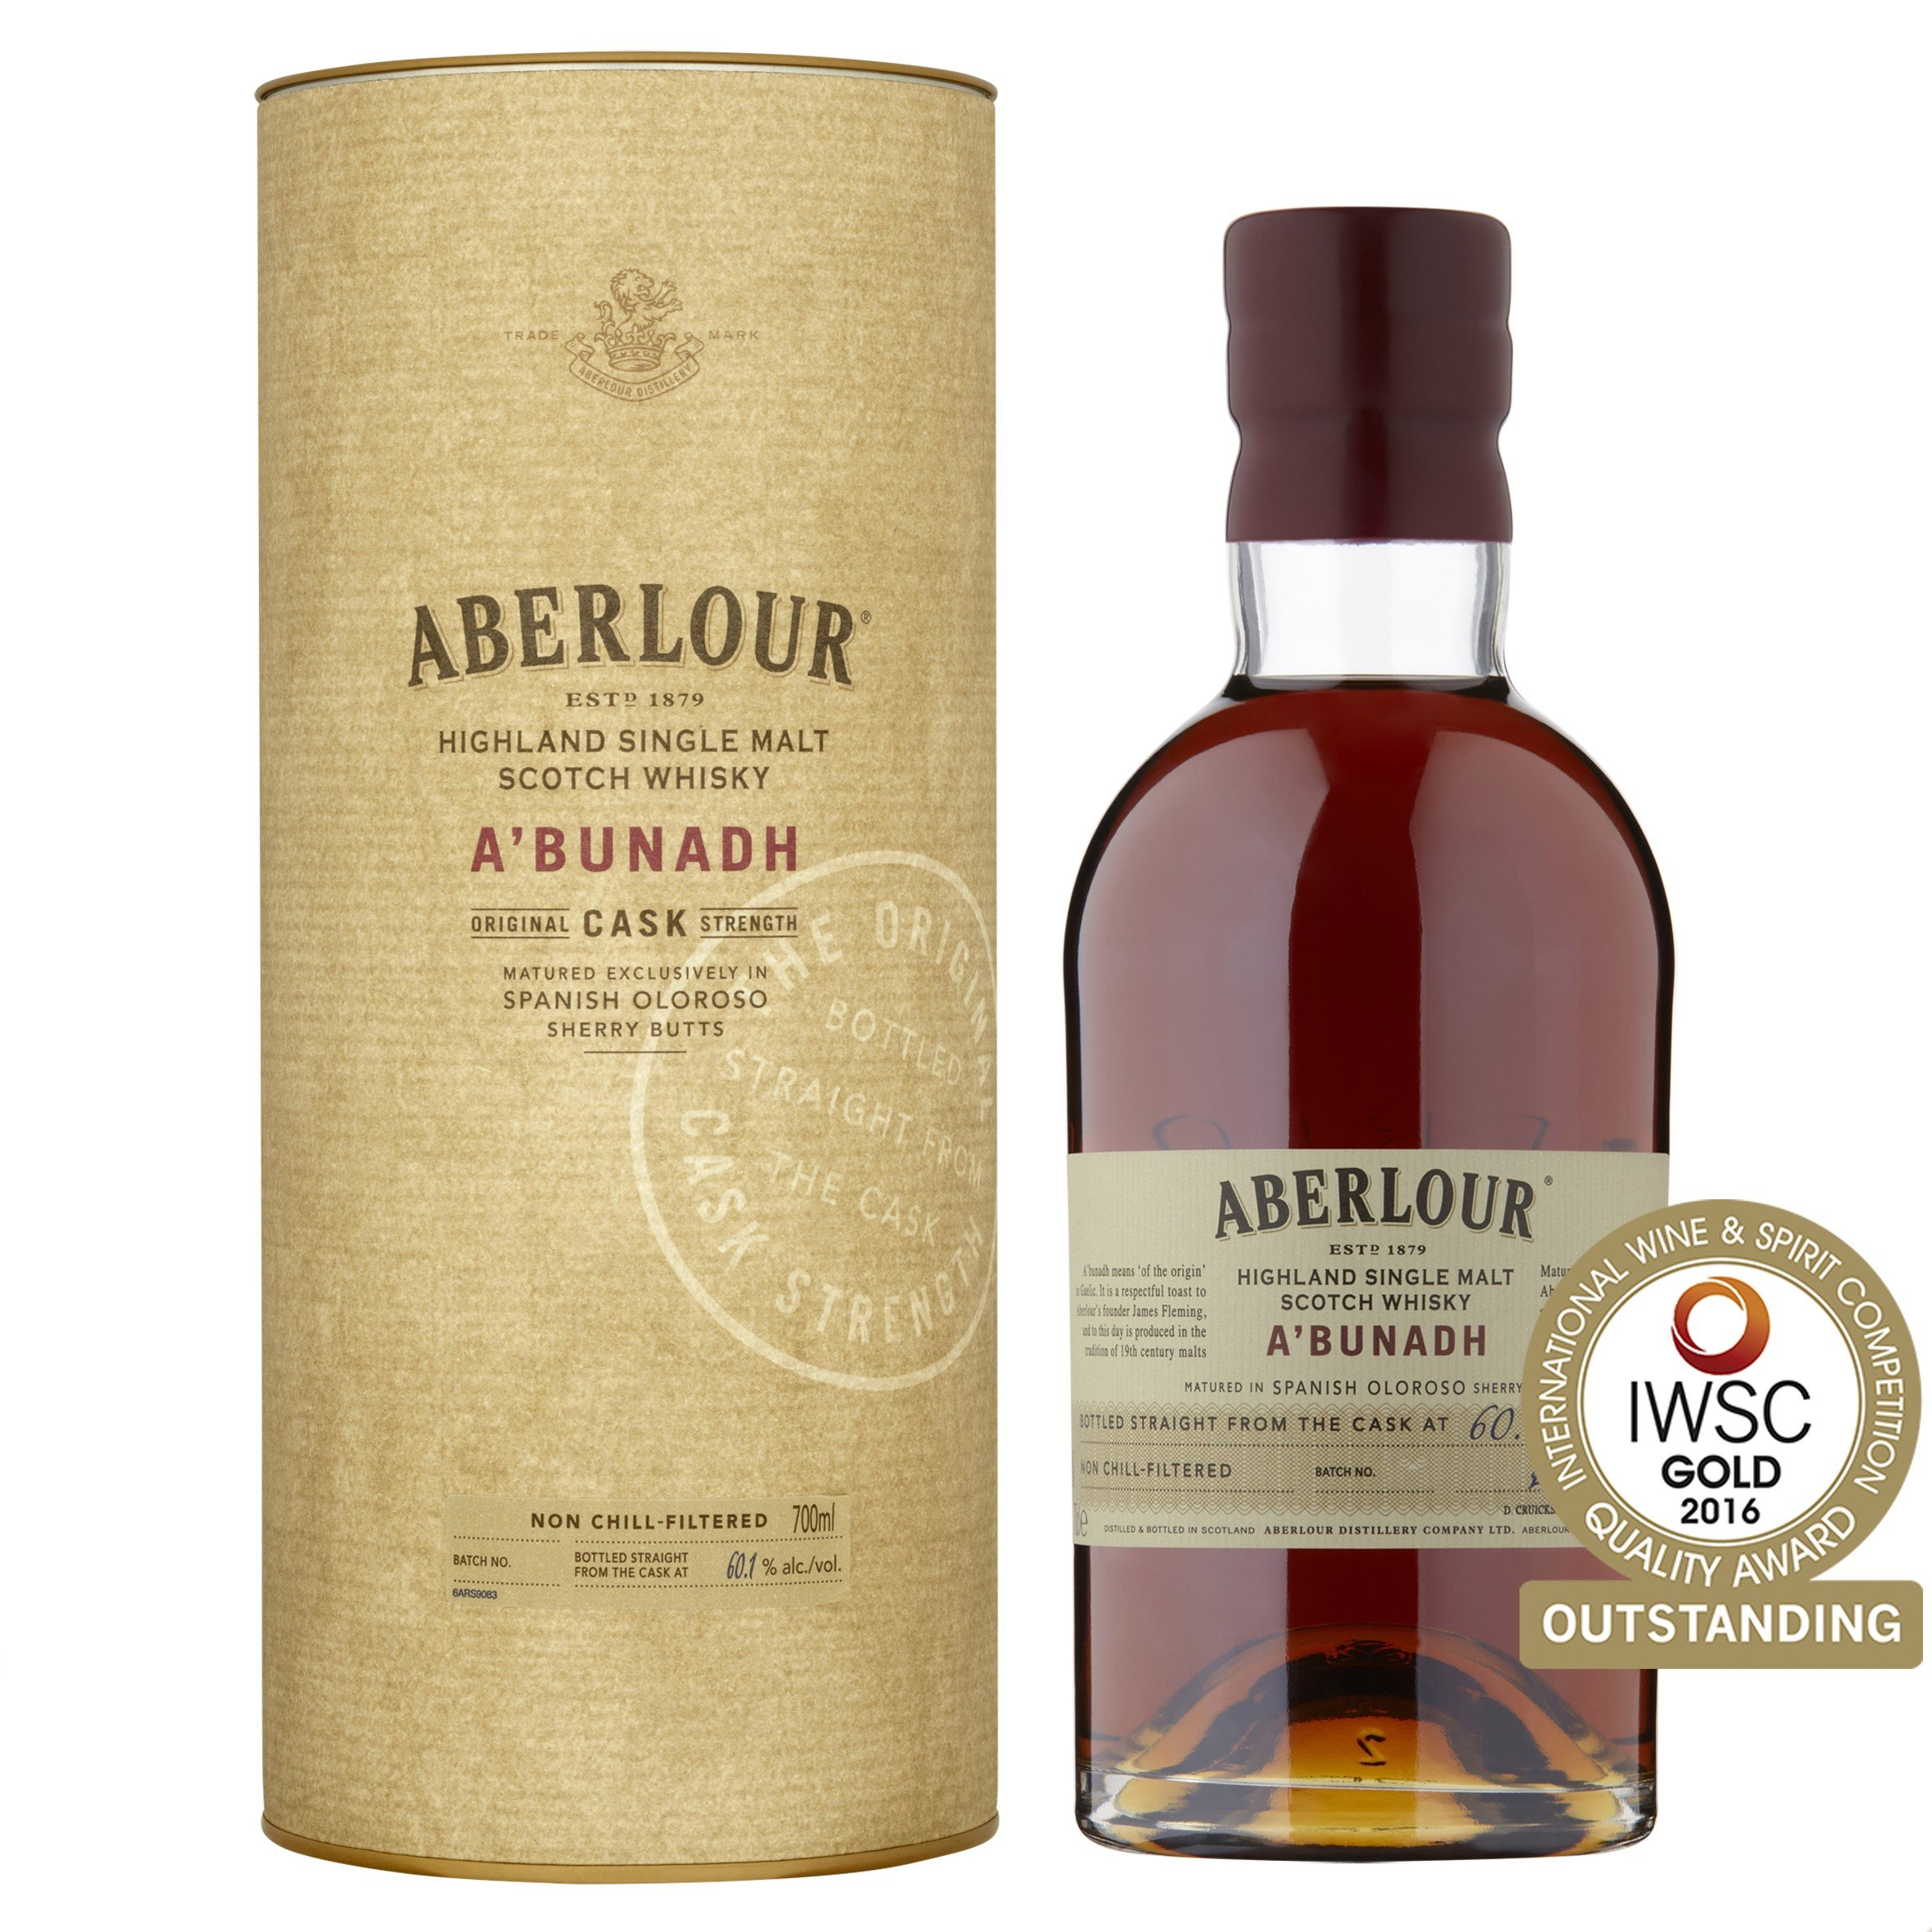 Aberlour A'Bunadh Single Malt Scotch Whisky, 70cl (Batch numbers may vary)